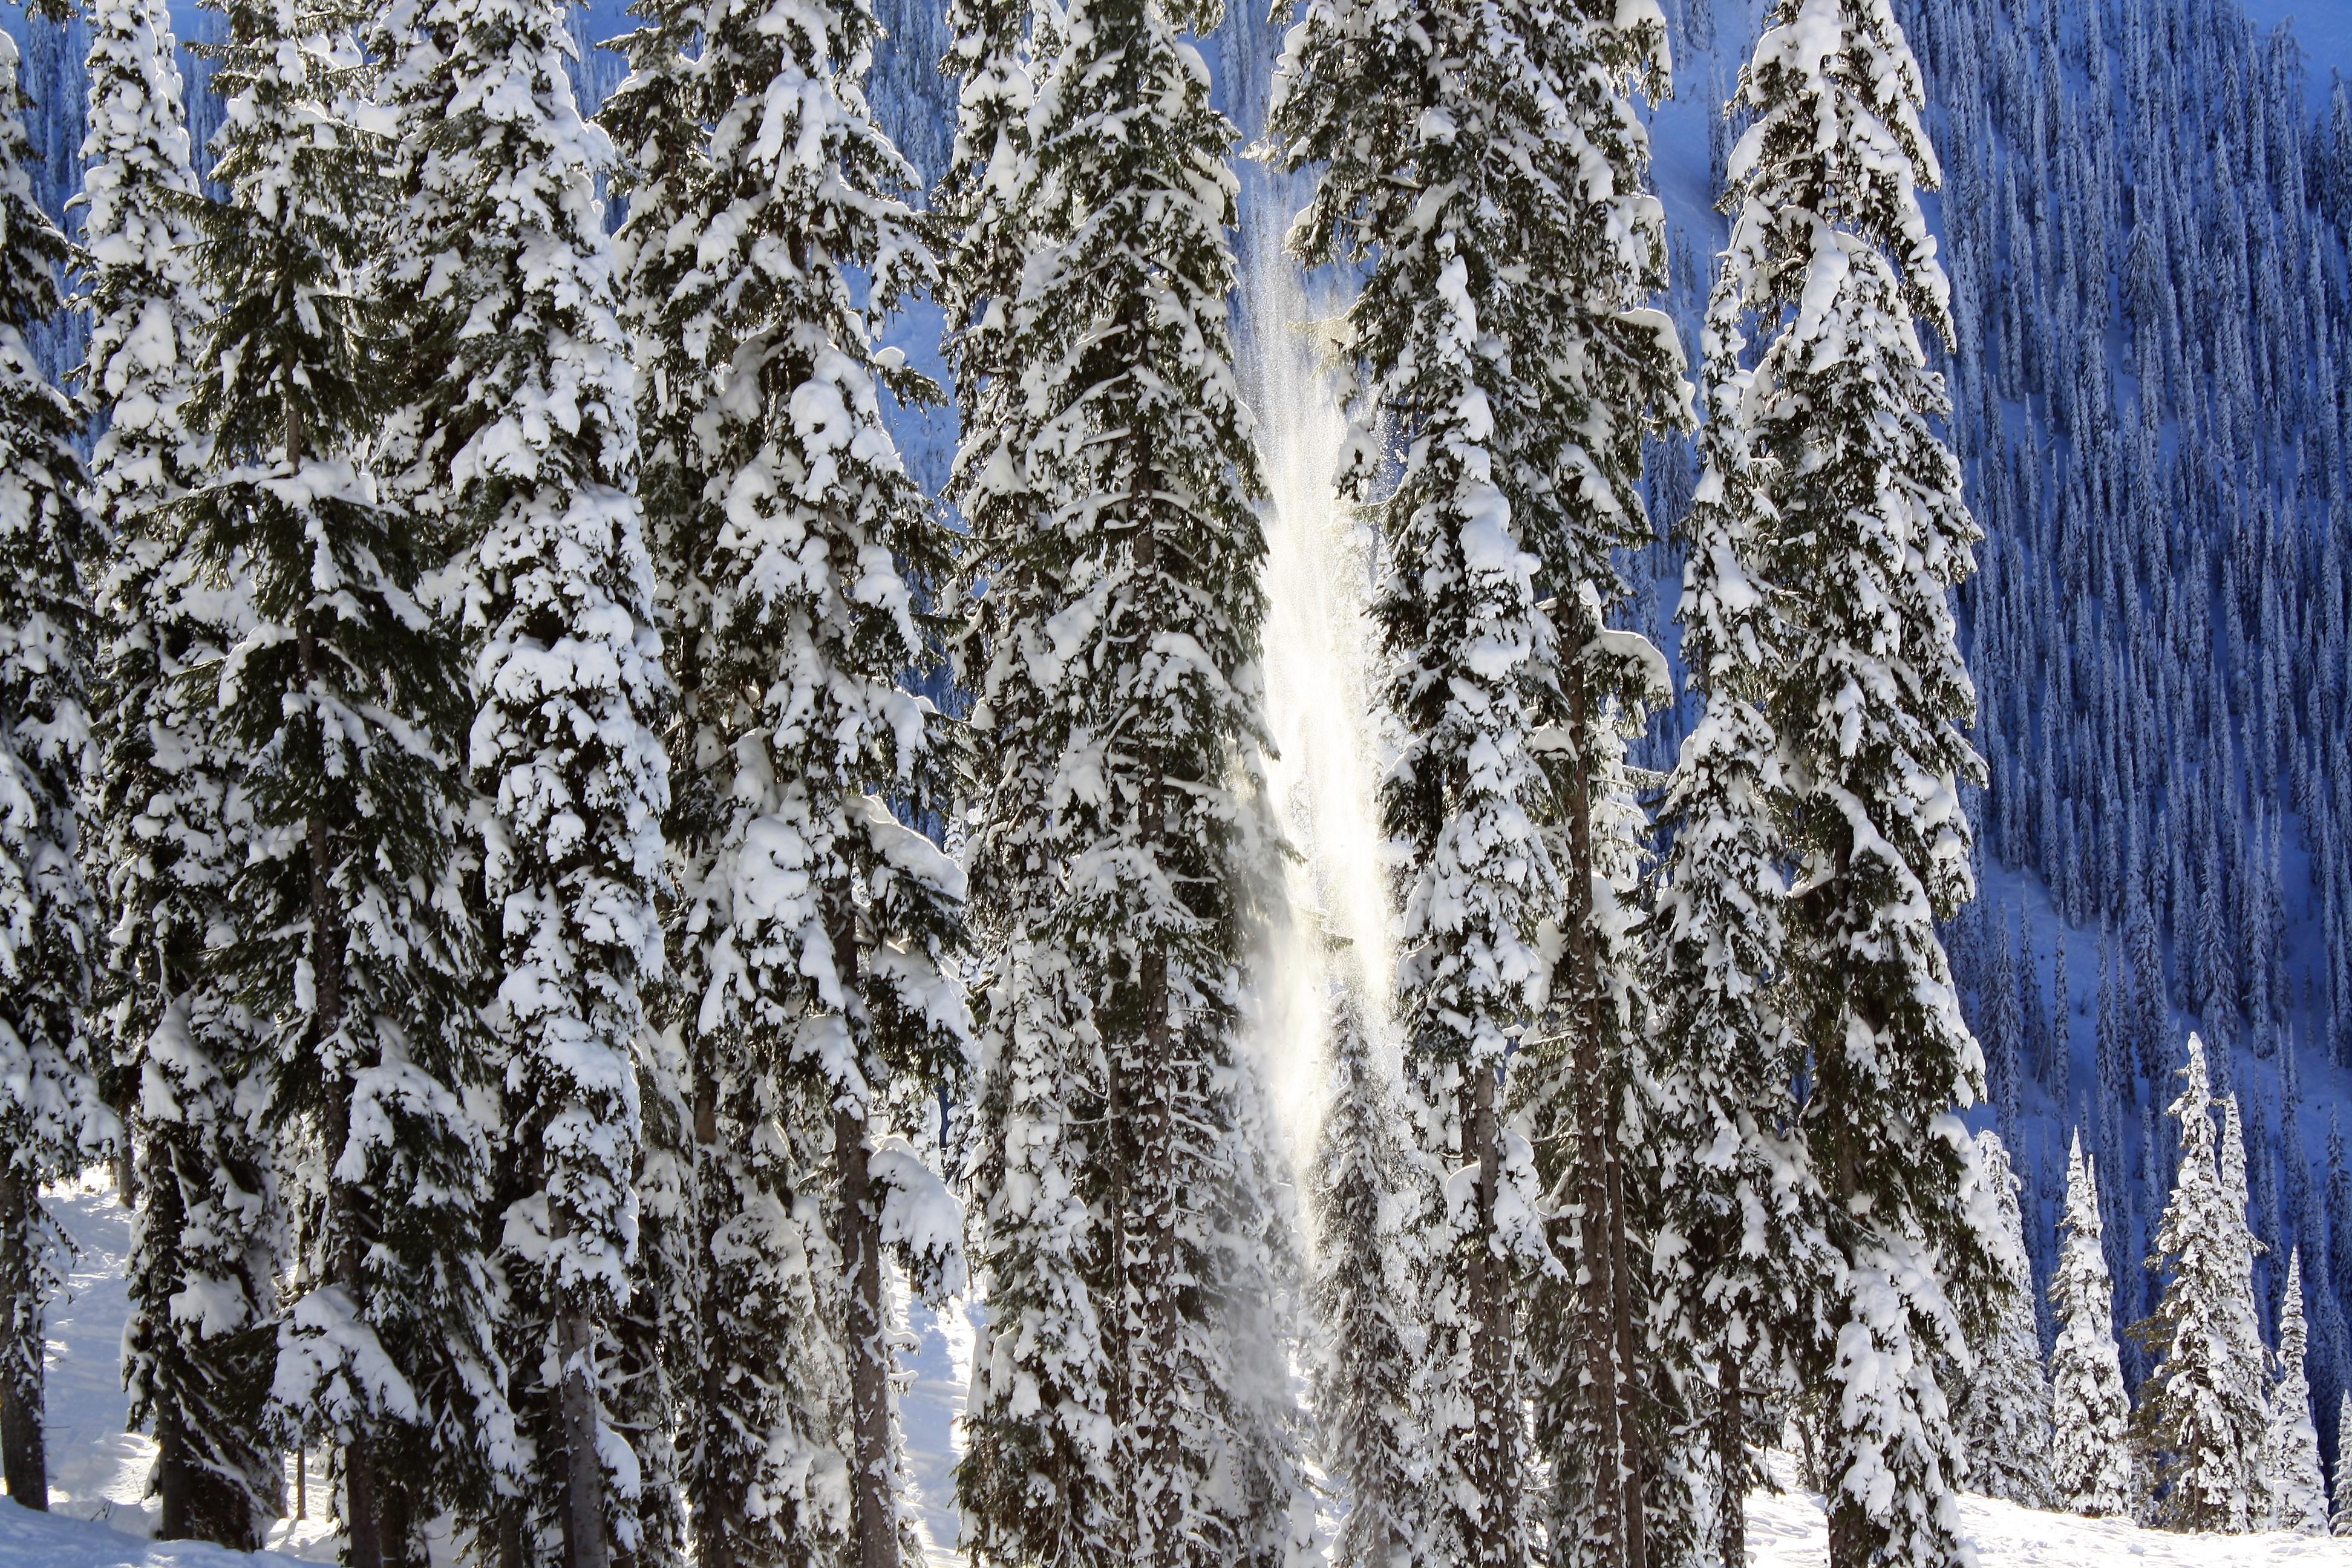 DM_nature_winter_kootenays_7996